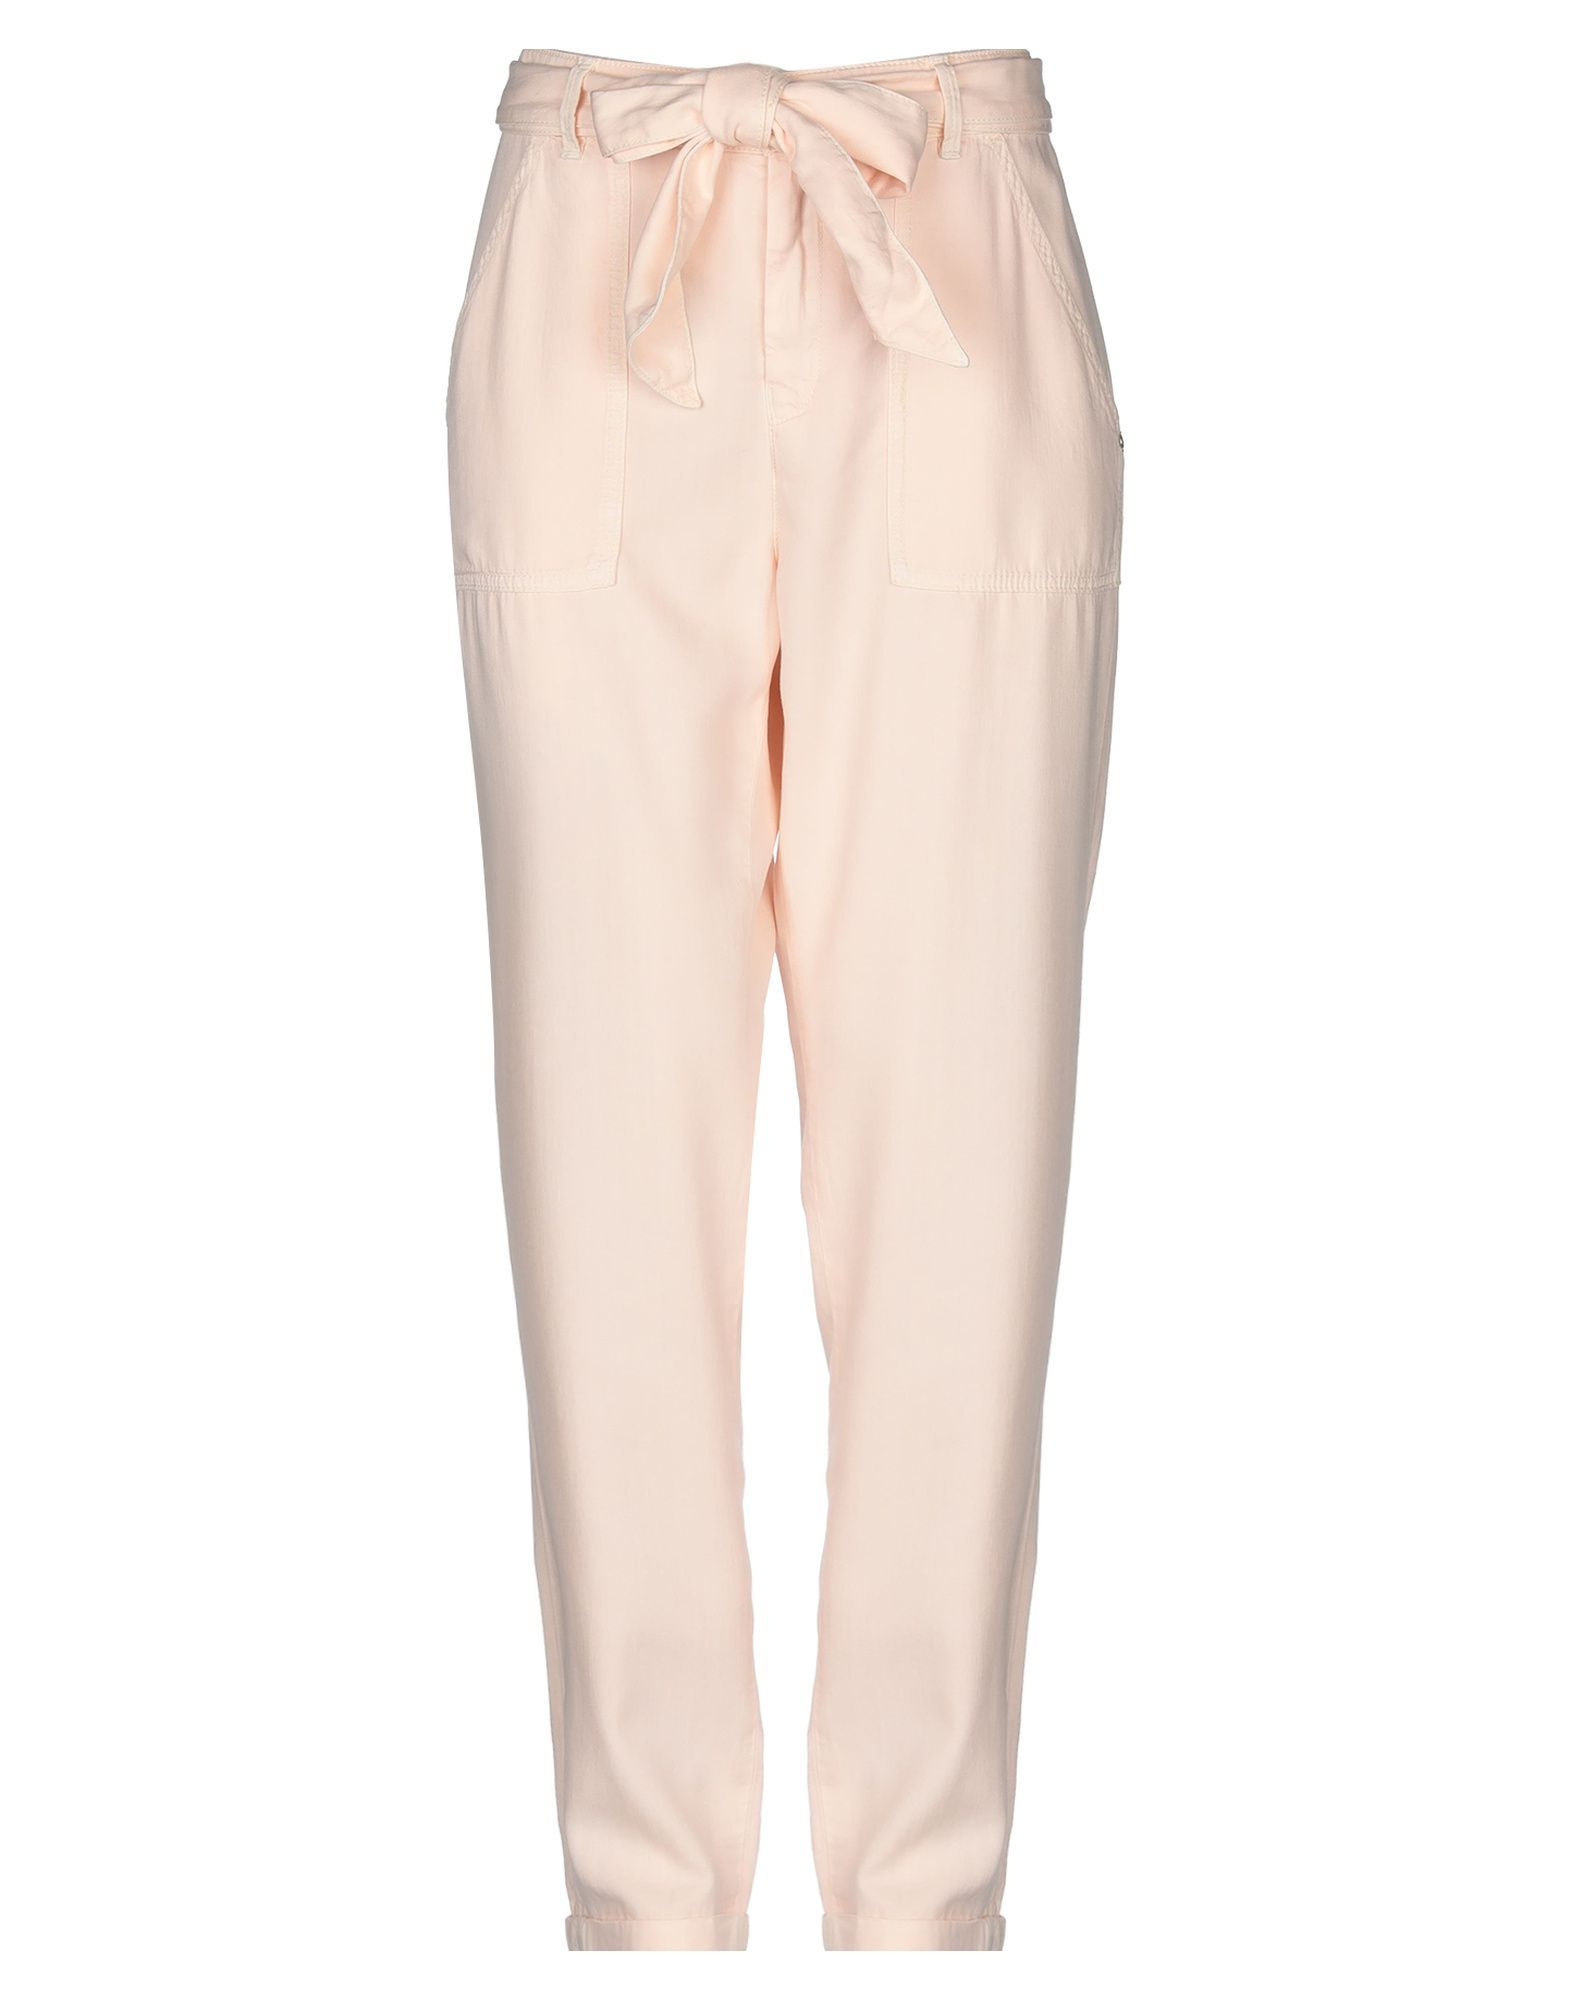 Gas Light Pink Straight Leg Trousers